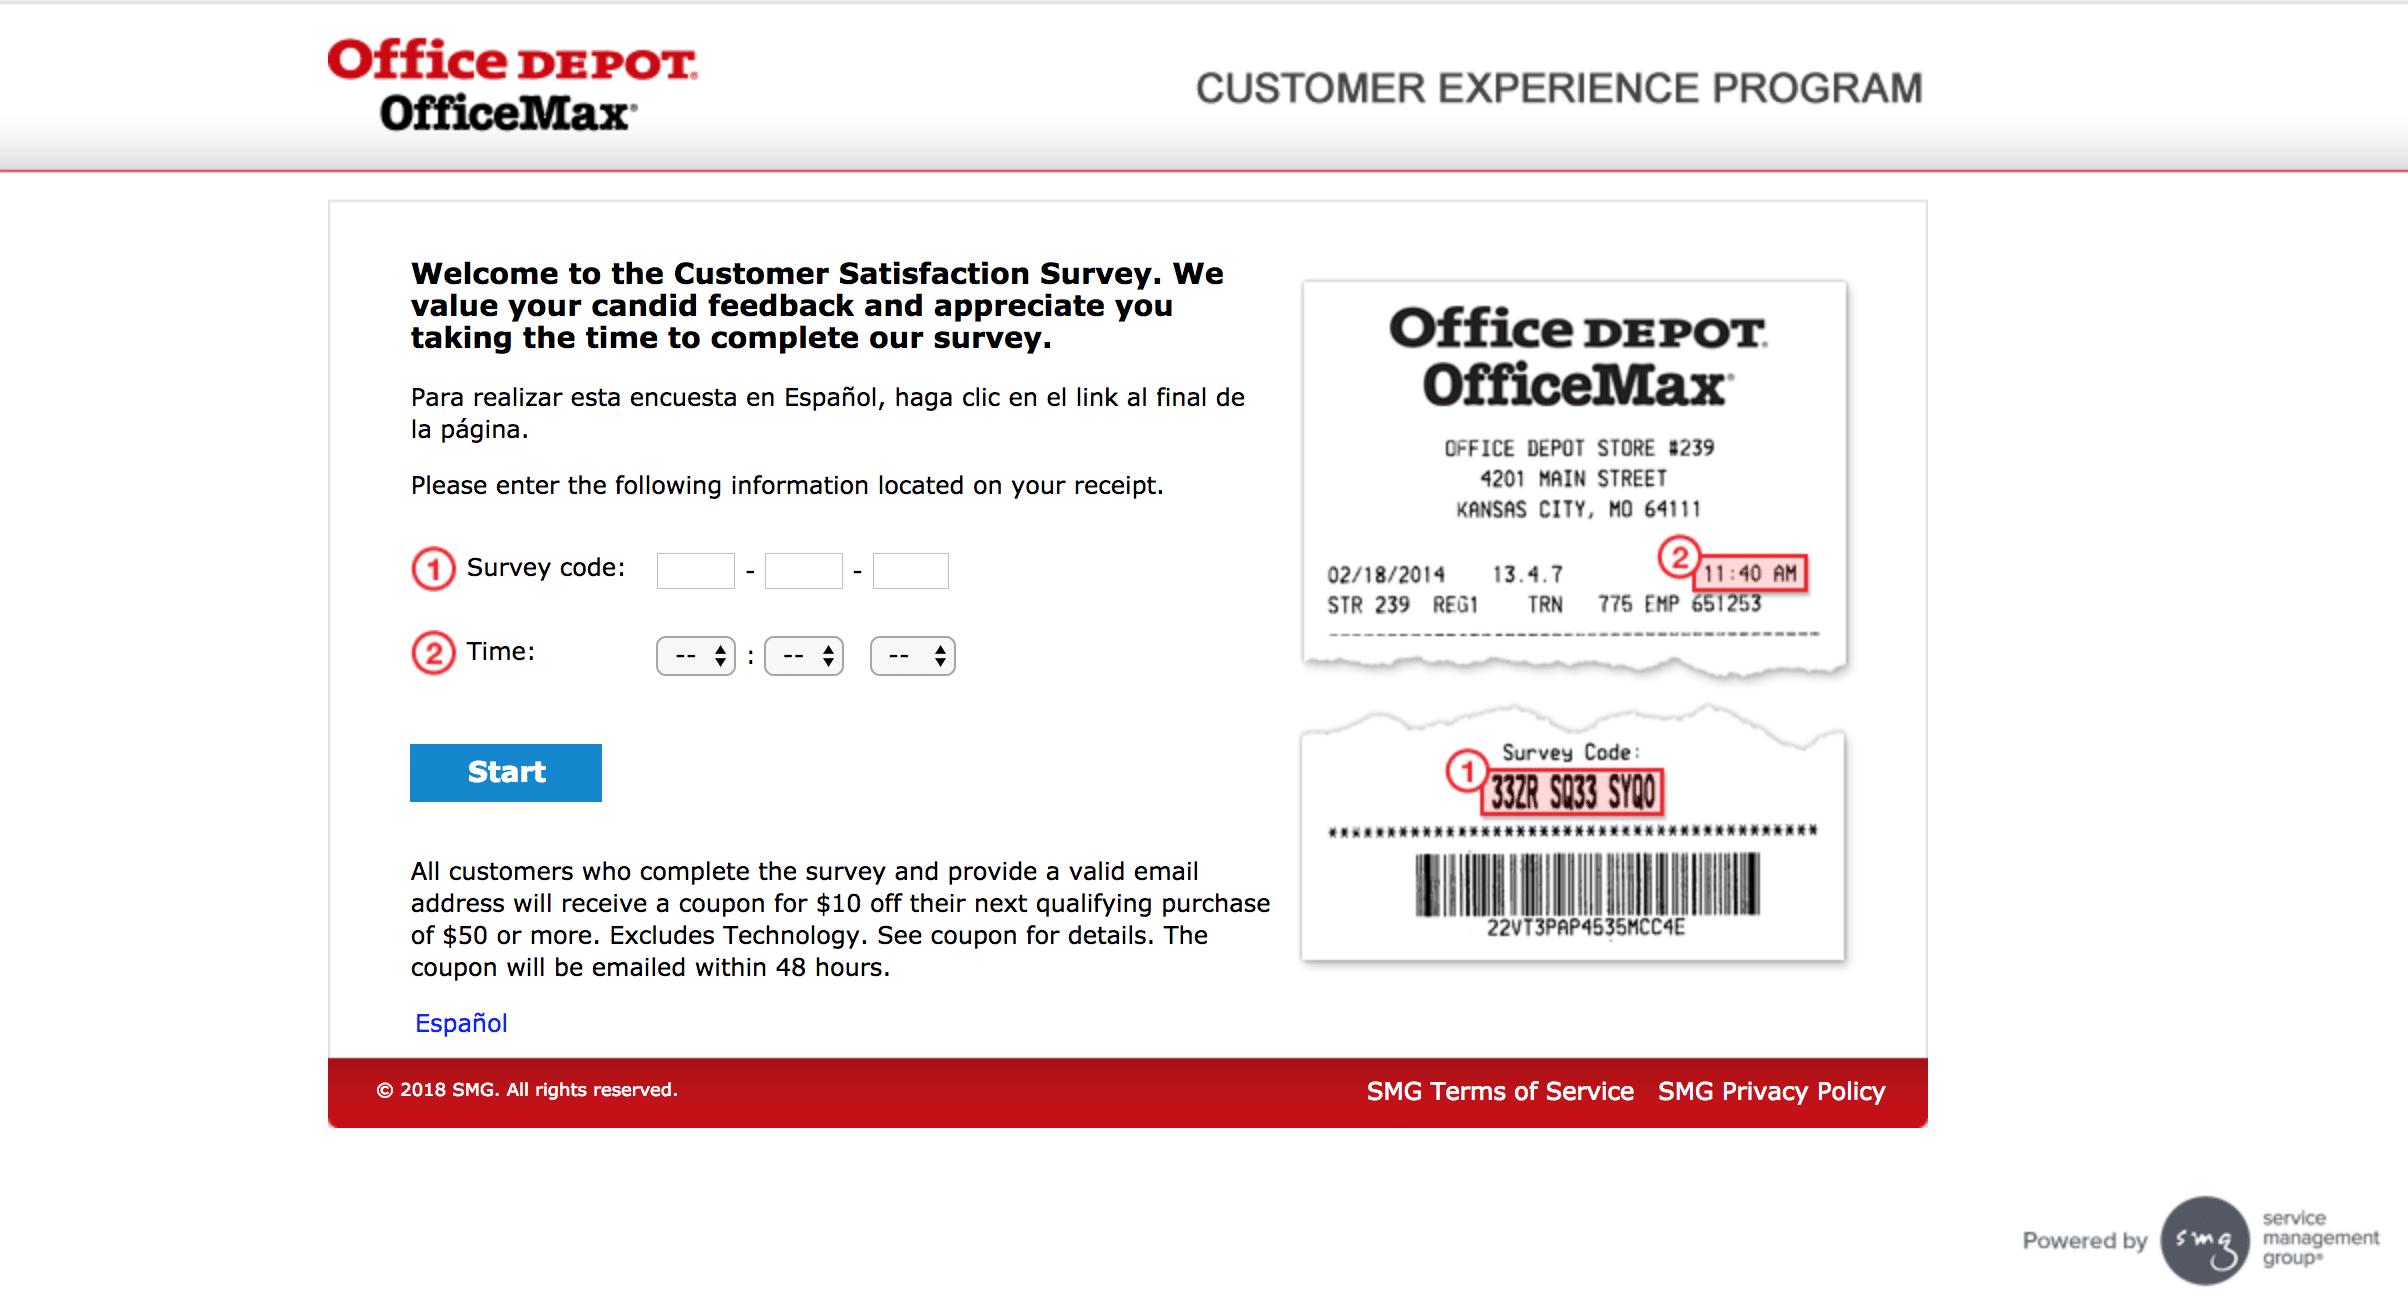 www.tellofficedepot.com